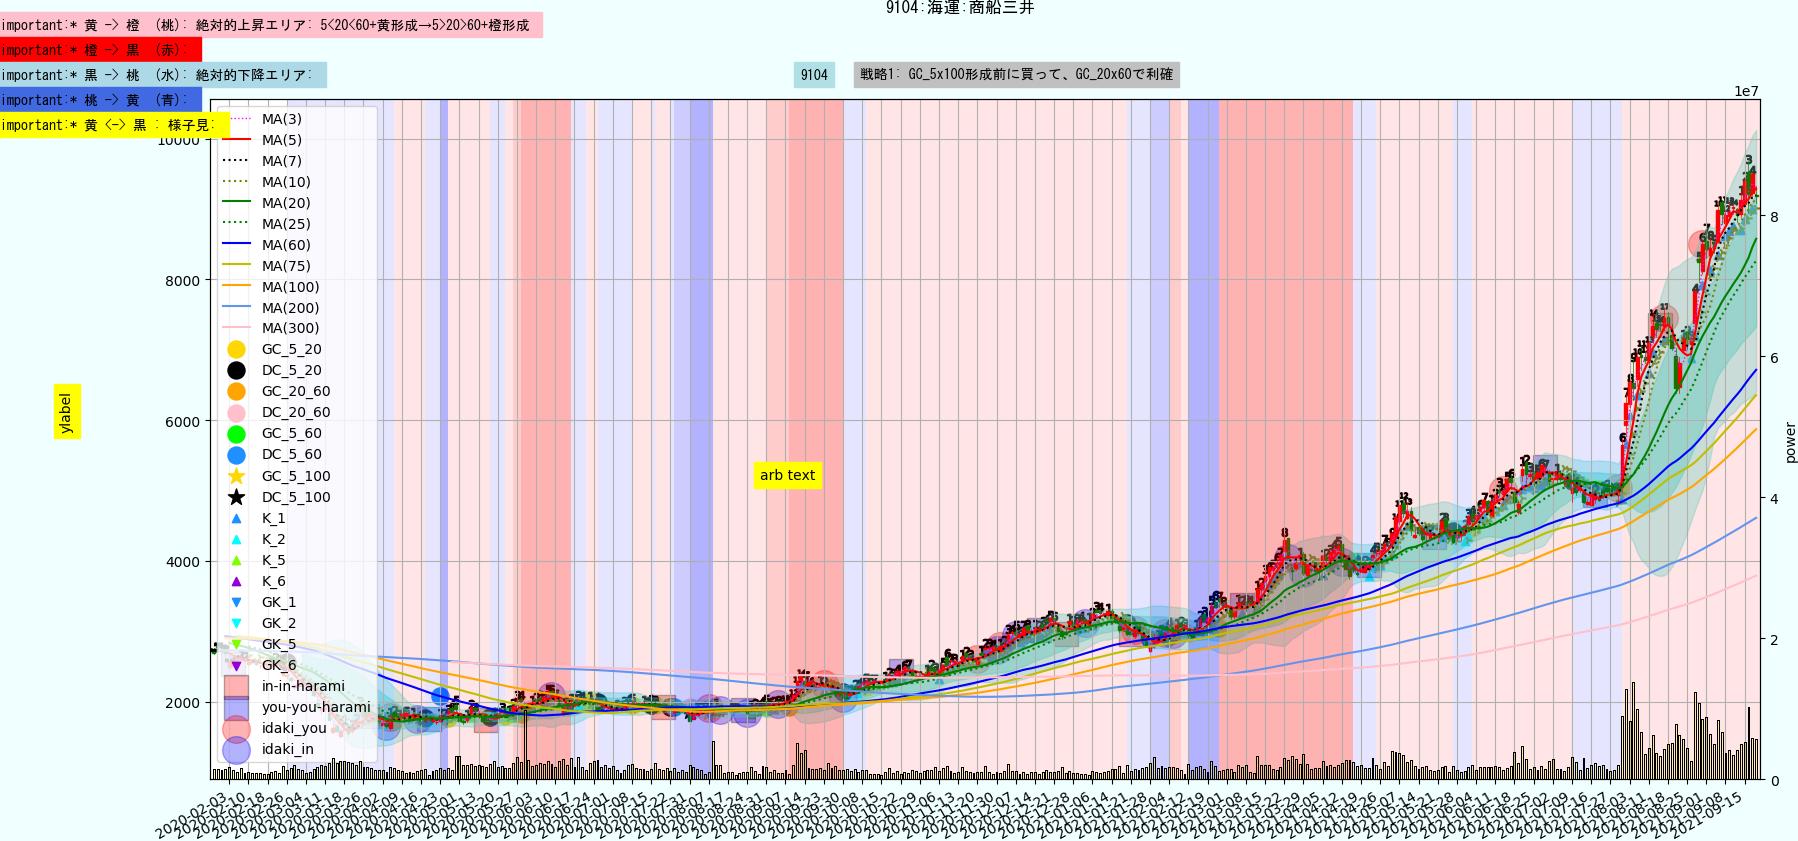 https://trident-capital-strage.s3.ap-northeast-1.amazonaws.com/charts/20210921/9104.png